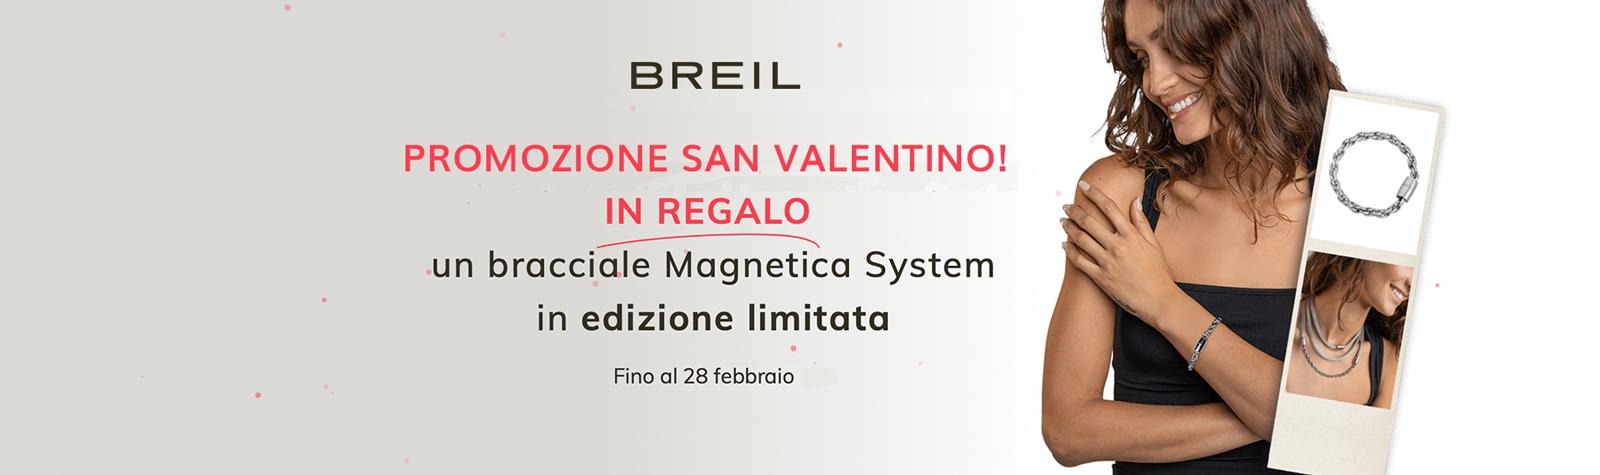 San valentino 2021 breil